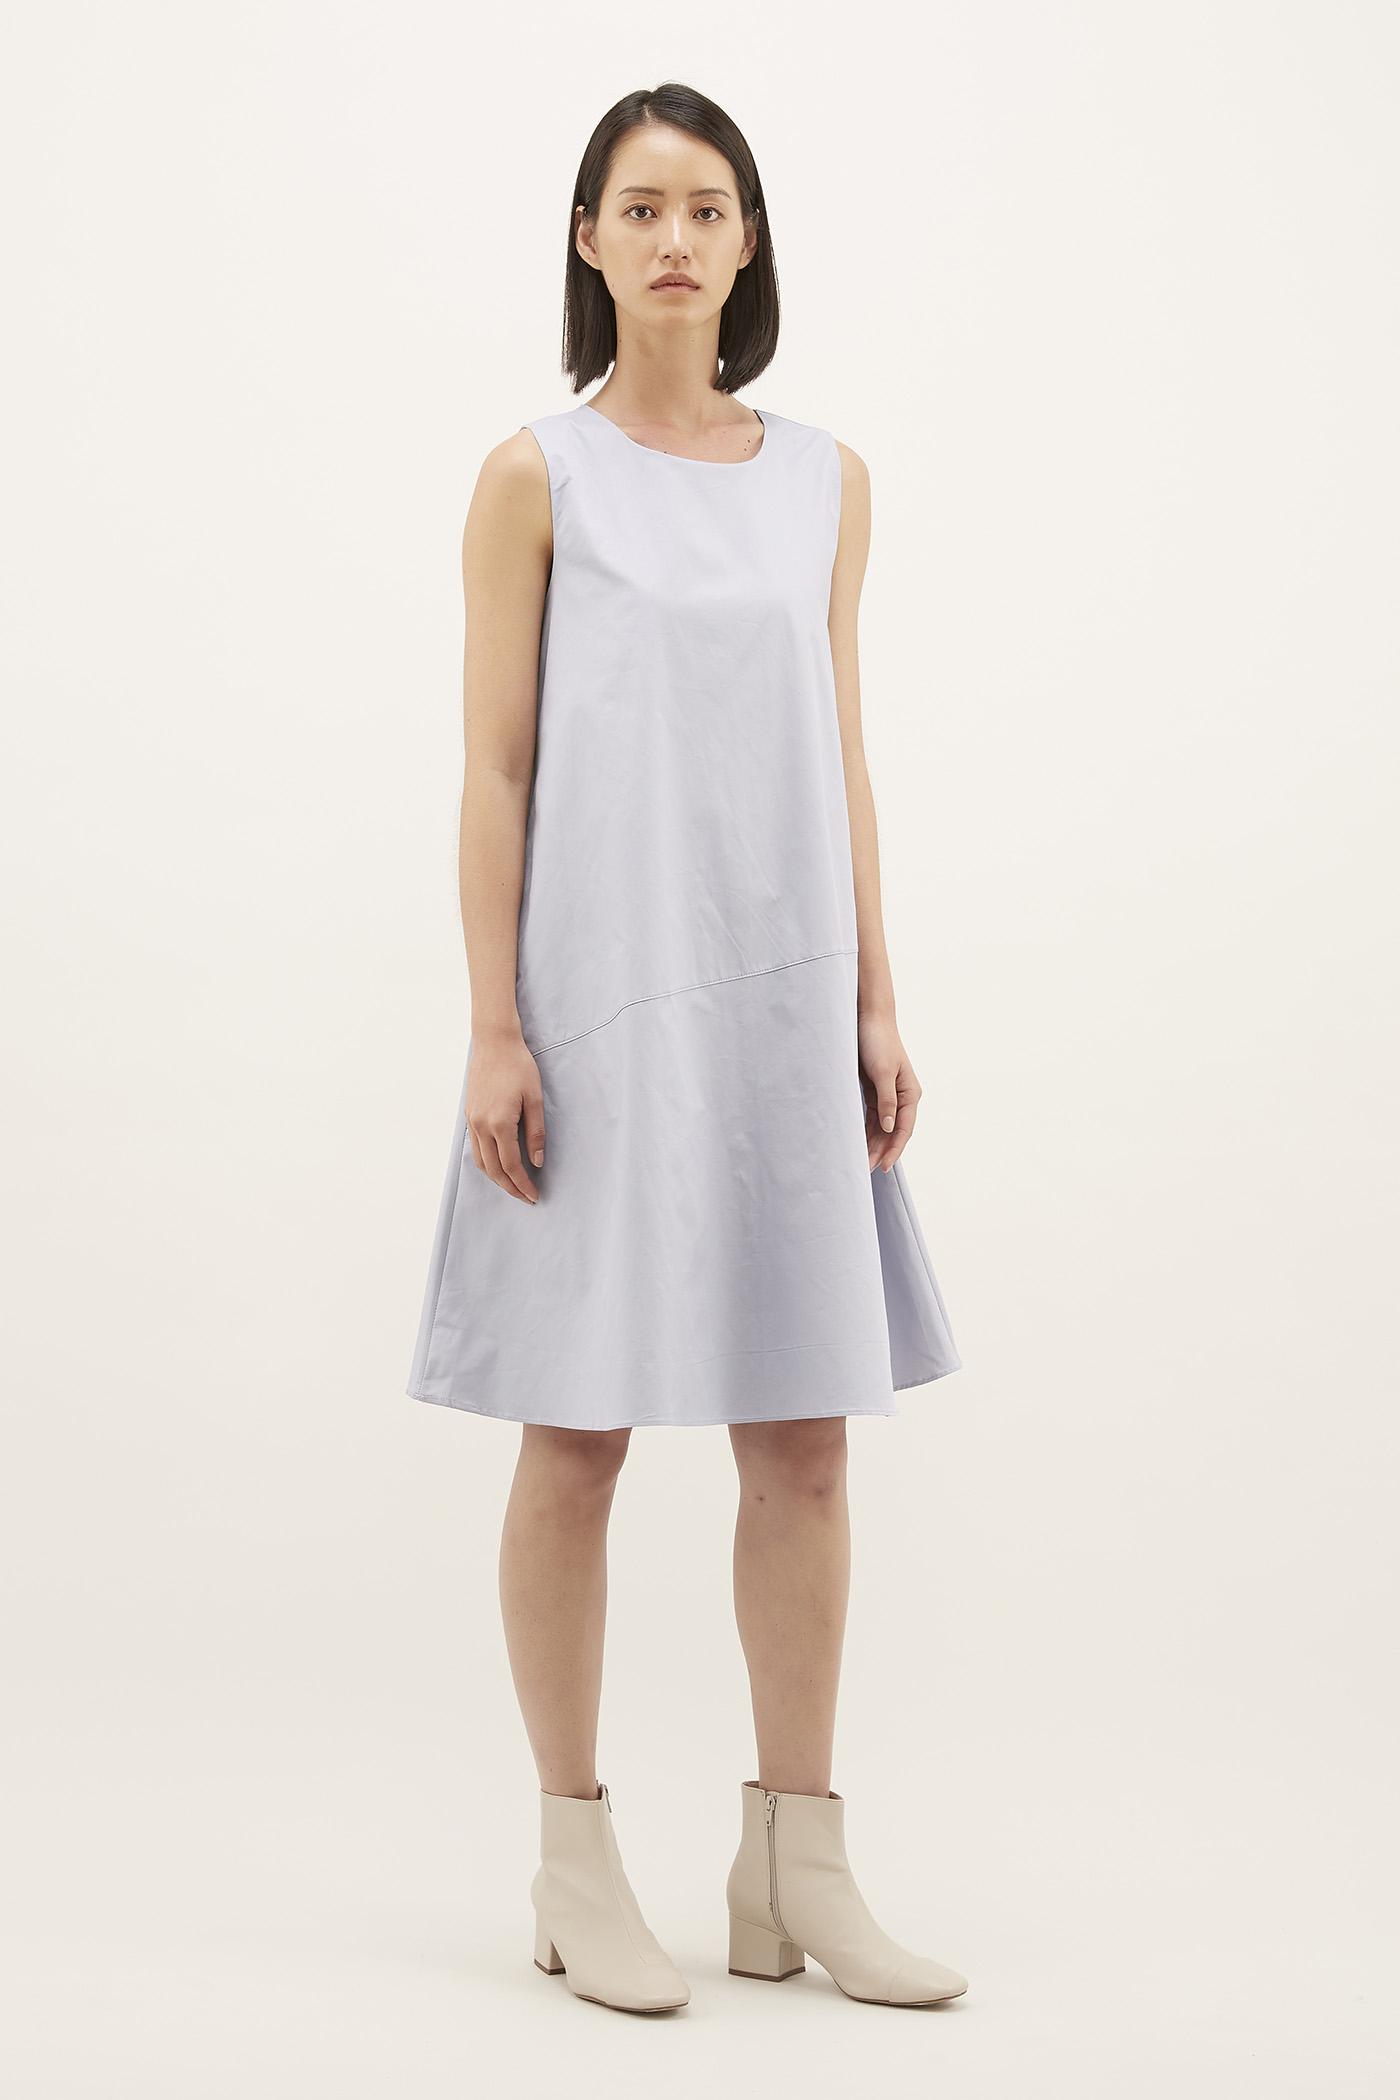 Haimi Tent Dress